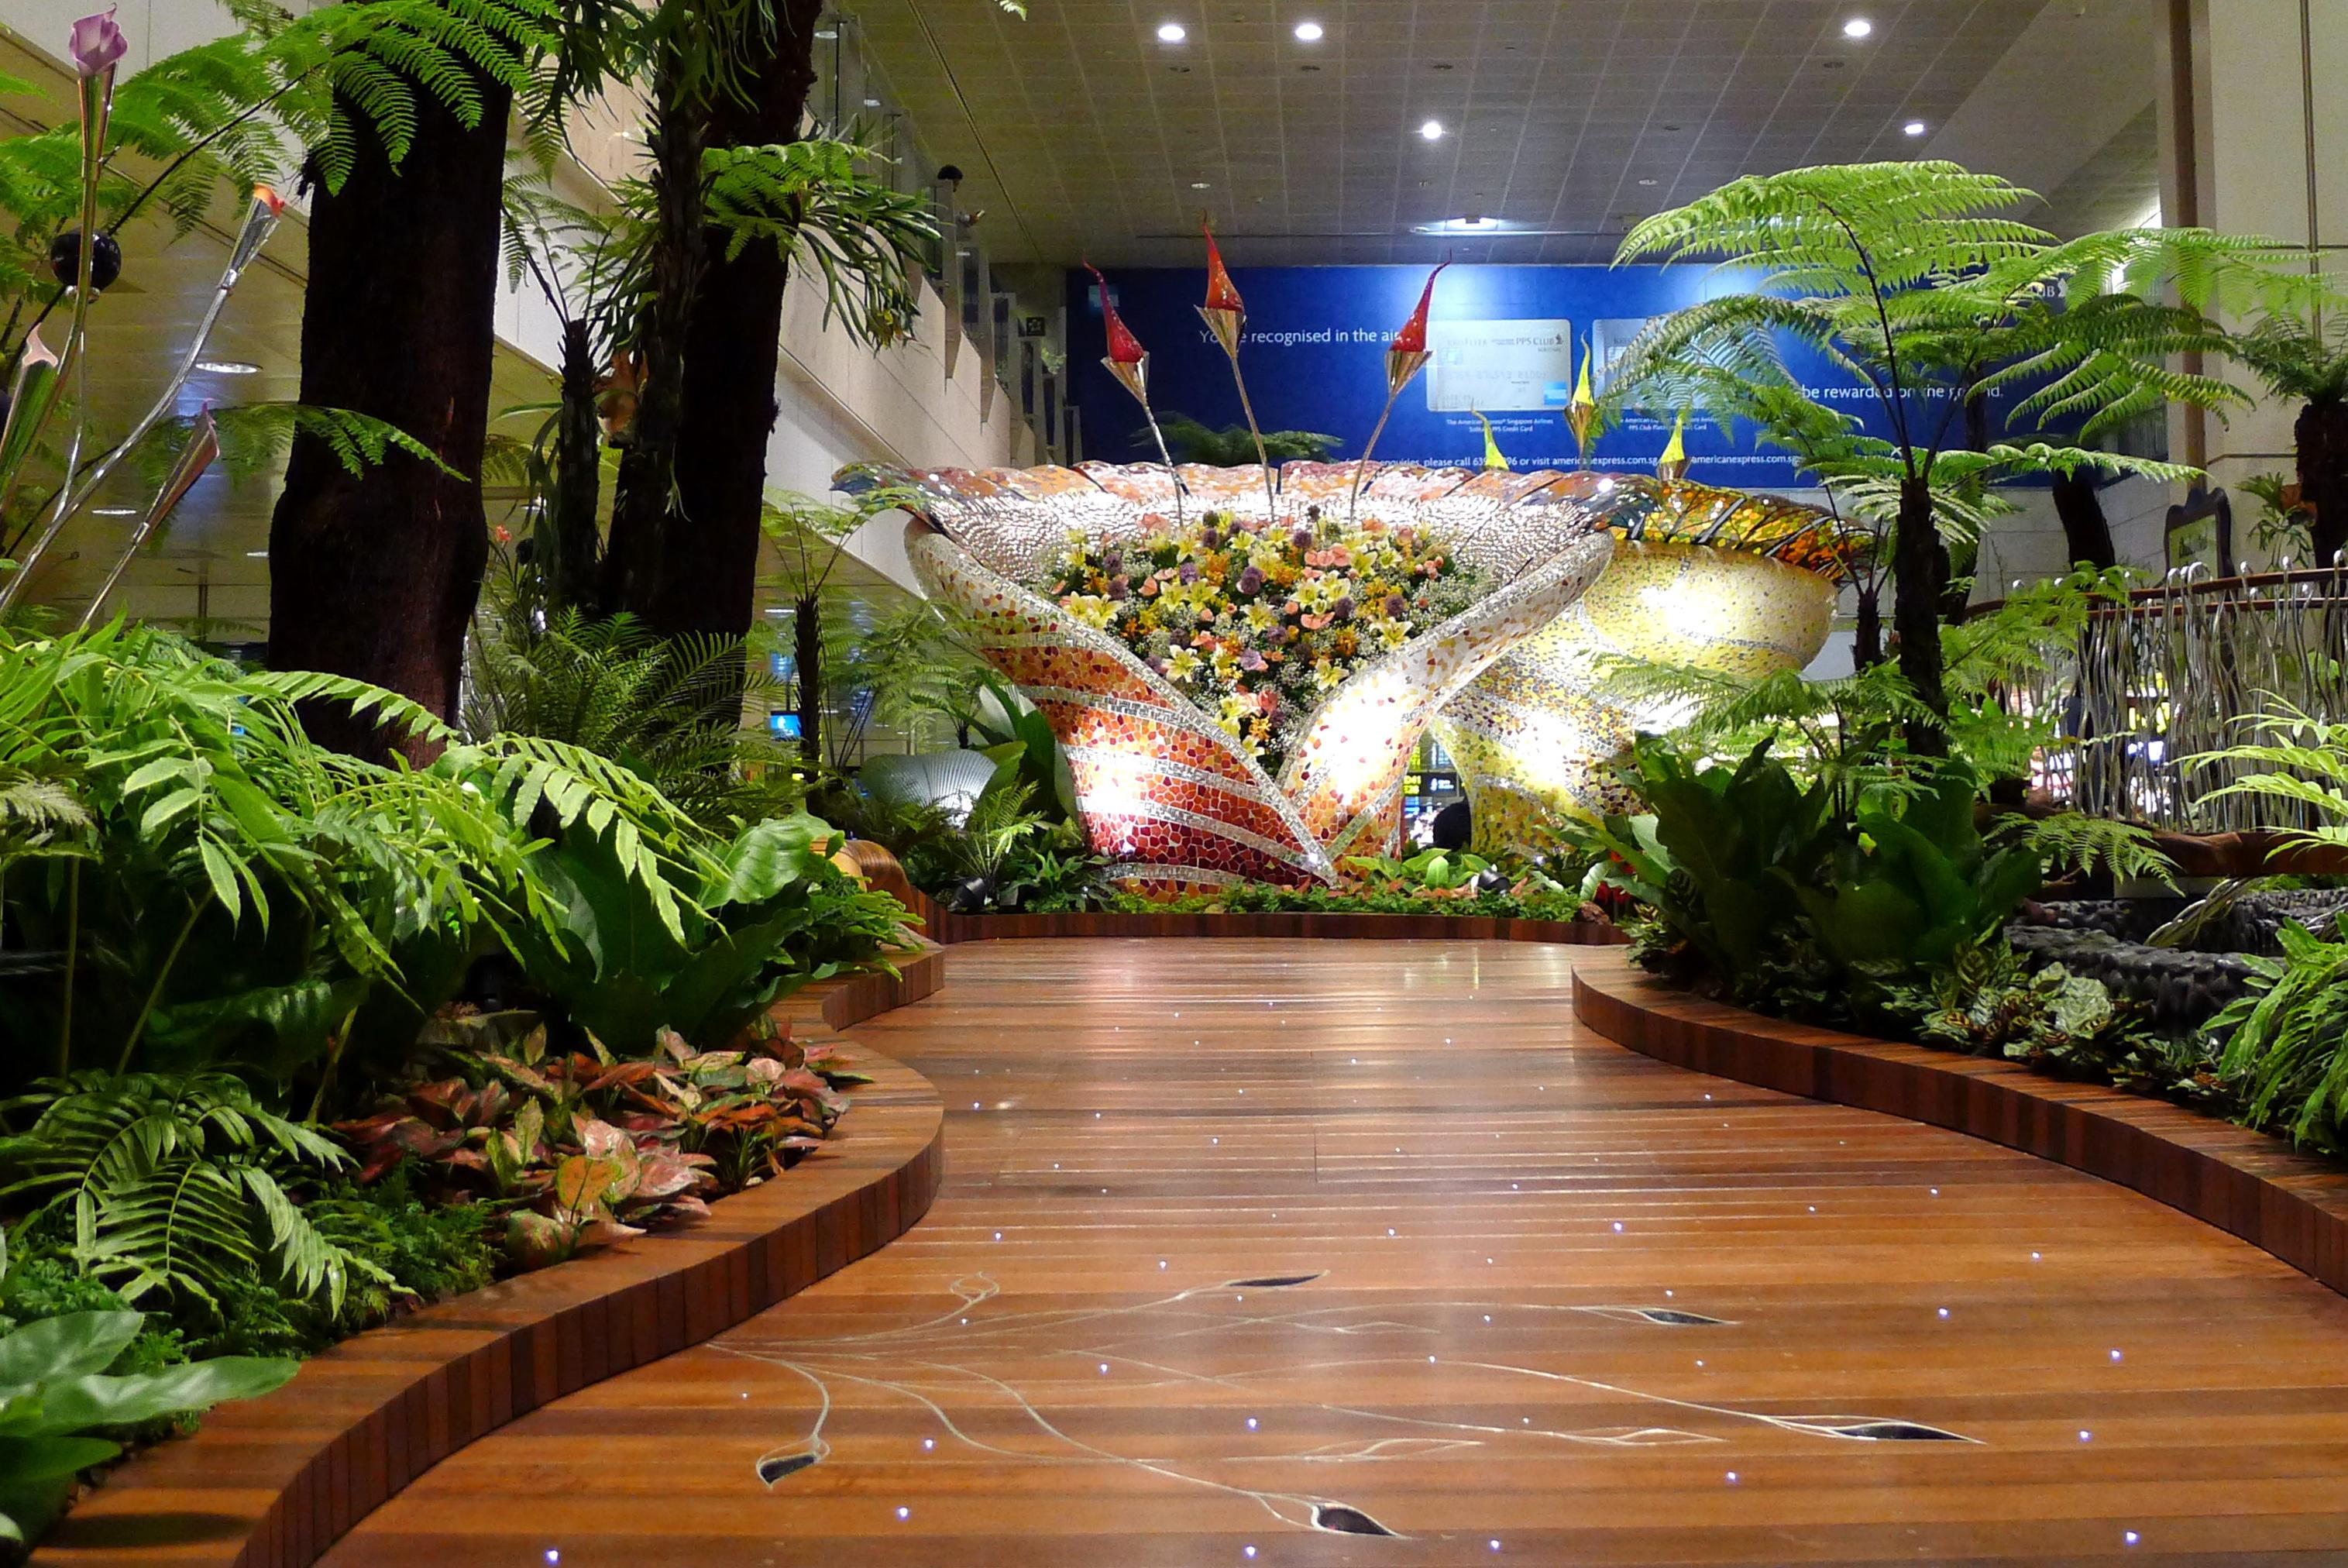 No. 1 International: Changi International Airport, Singapore